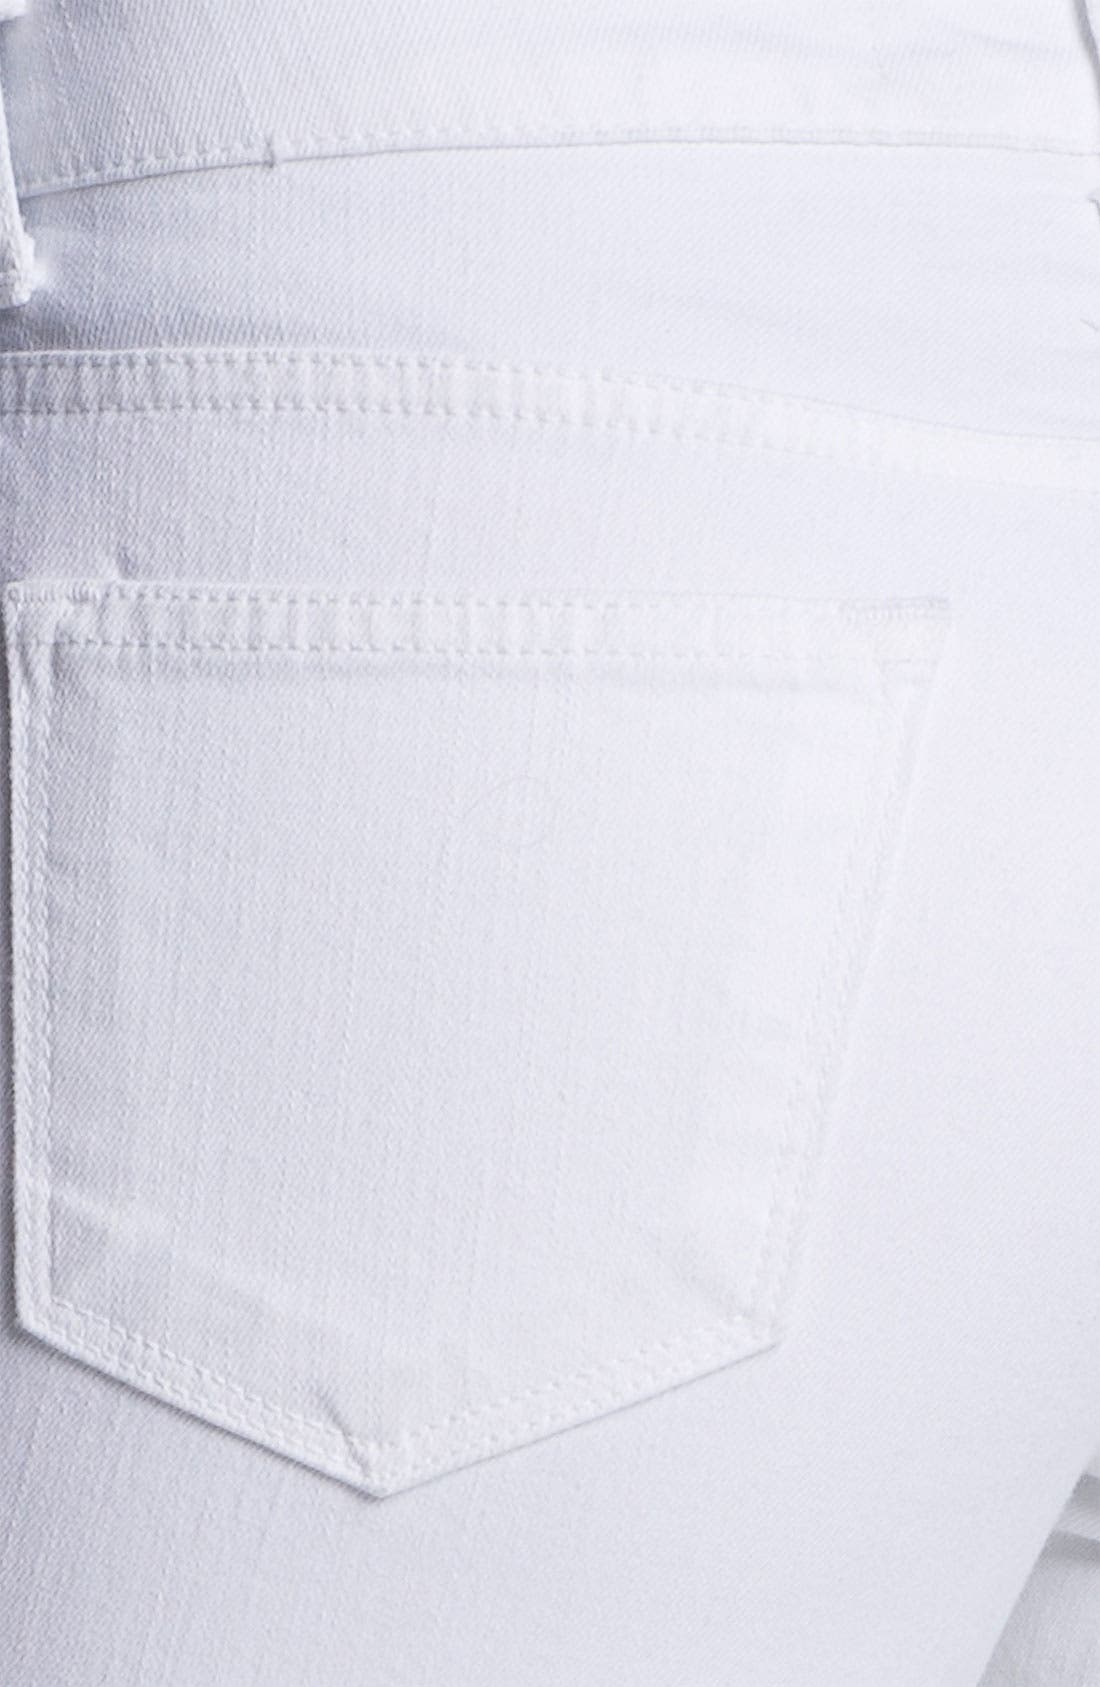 Alternate Image 3  - CJ by Cookie Johnson 'Peace' Skinny Jeans